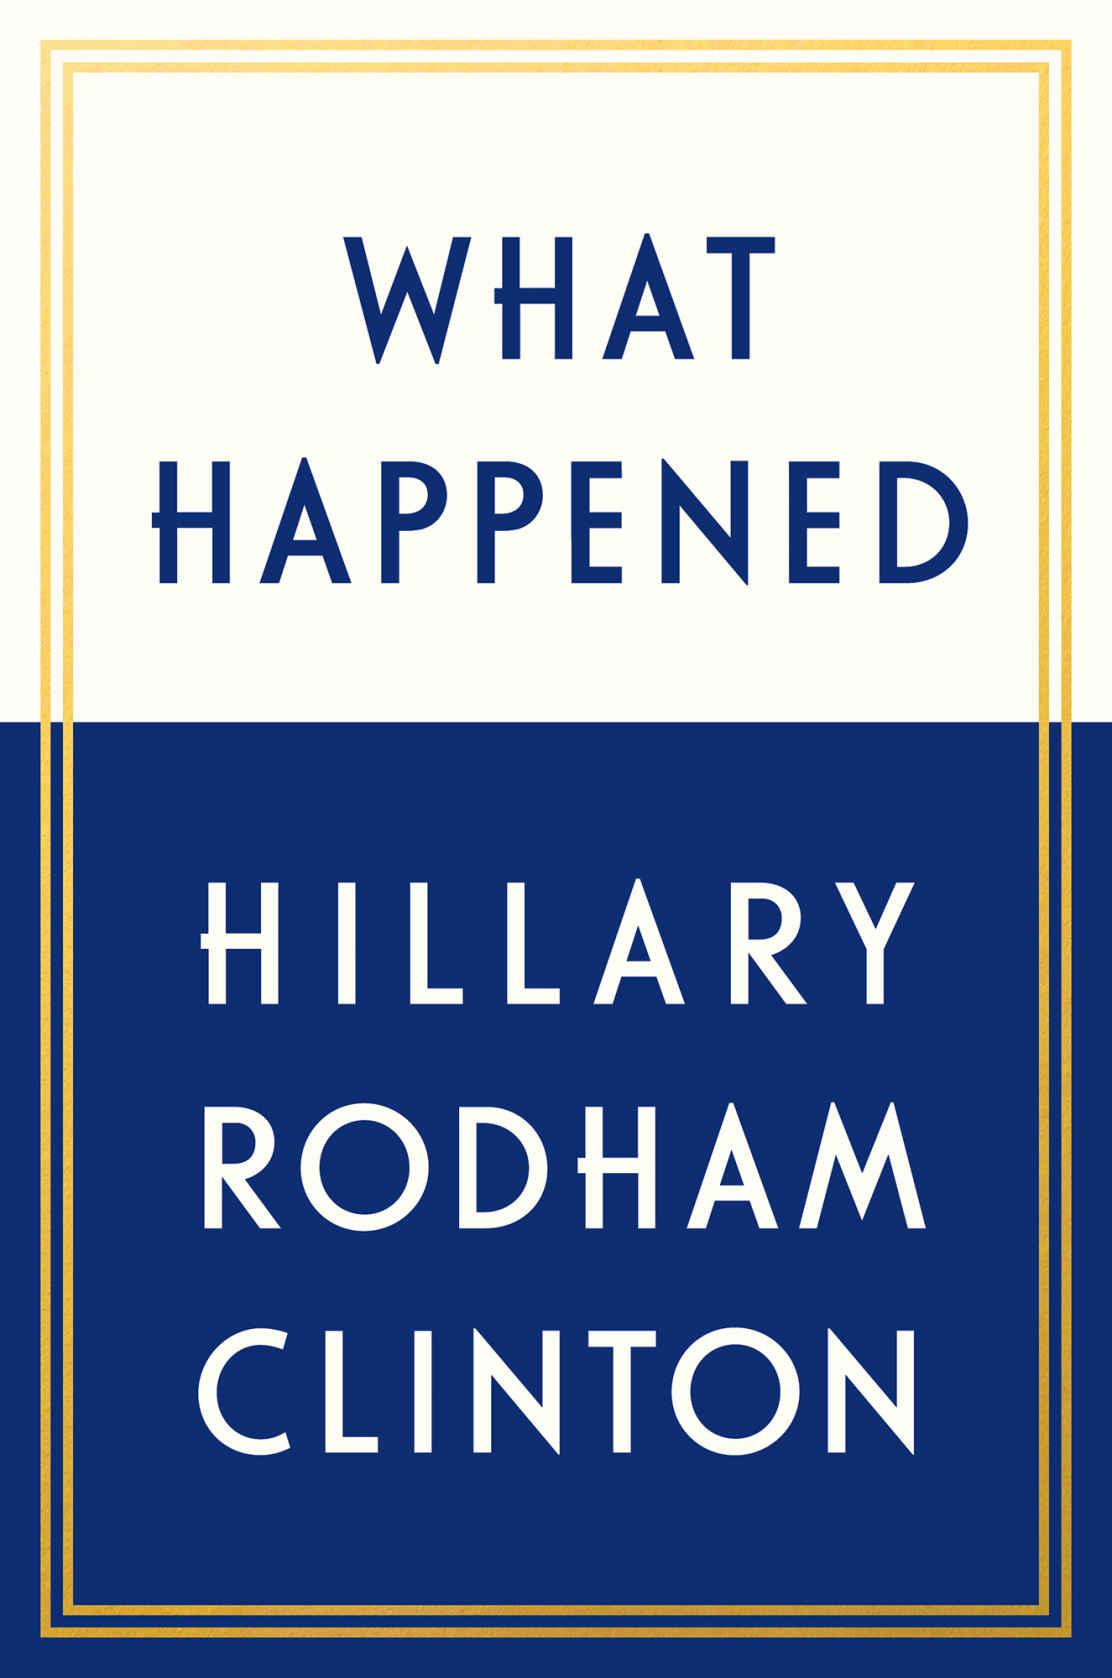 What Happened - Hillary Rodham Clinton [kindle] [mobi]